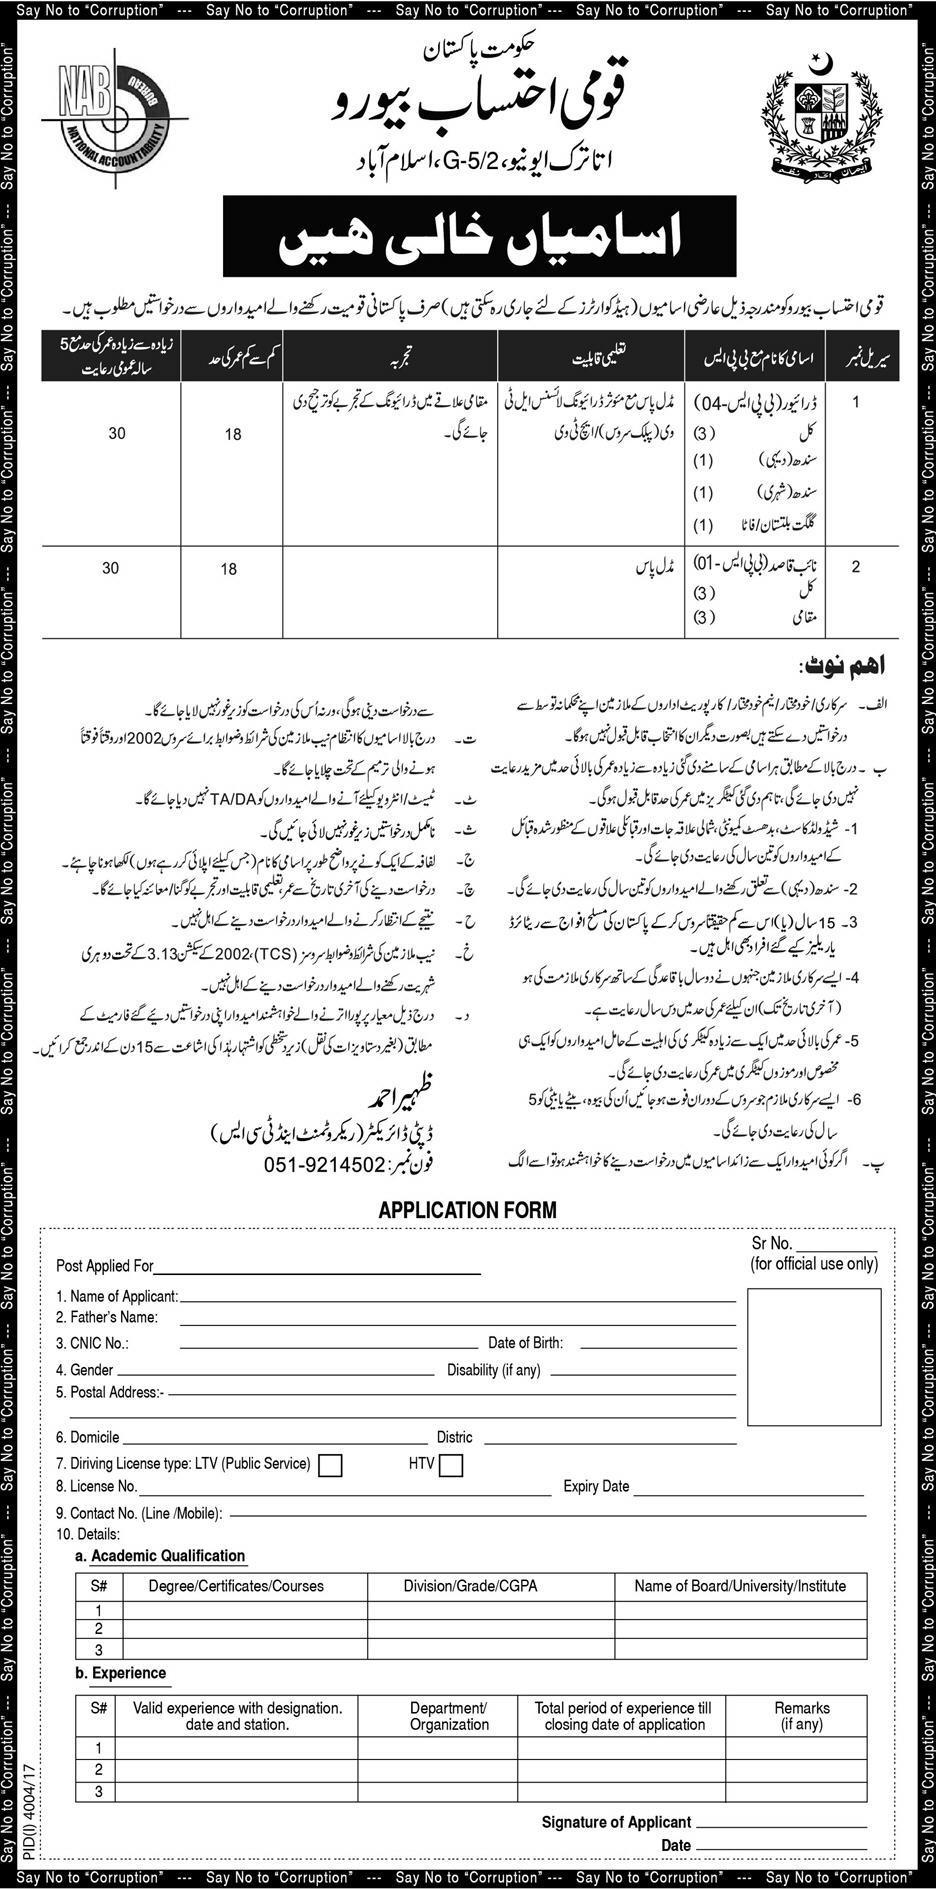 Islamabad National Accountability Bureau (NAB) 06 jobs 28/01/2018, Daily Express Newspaper